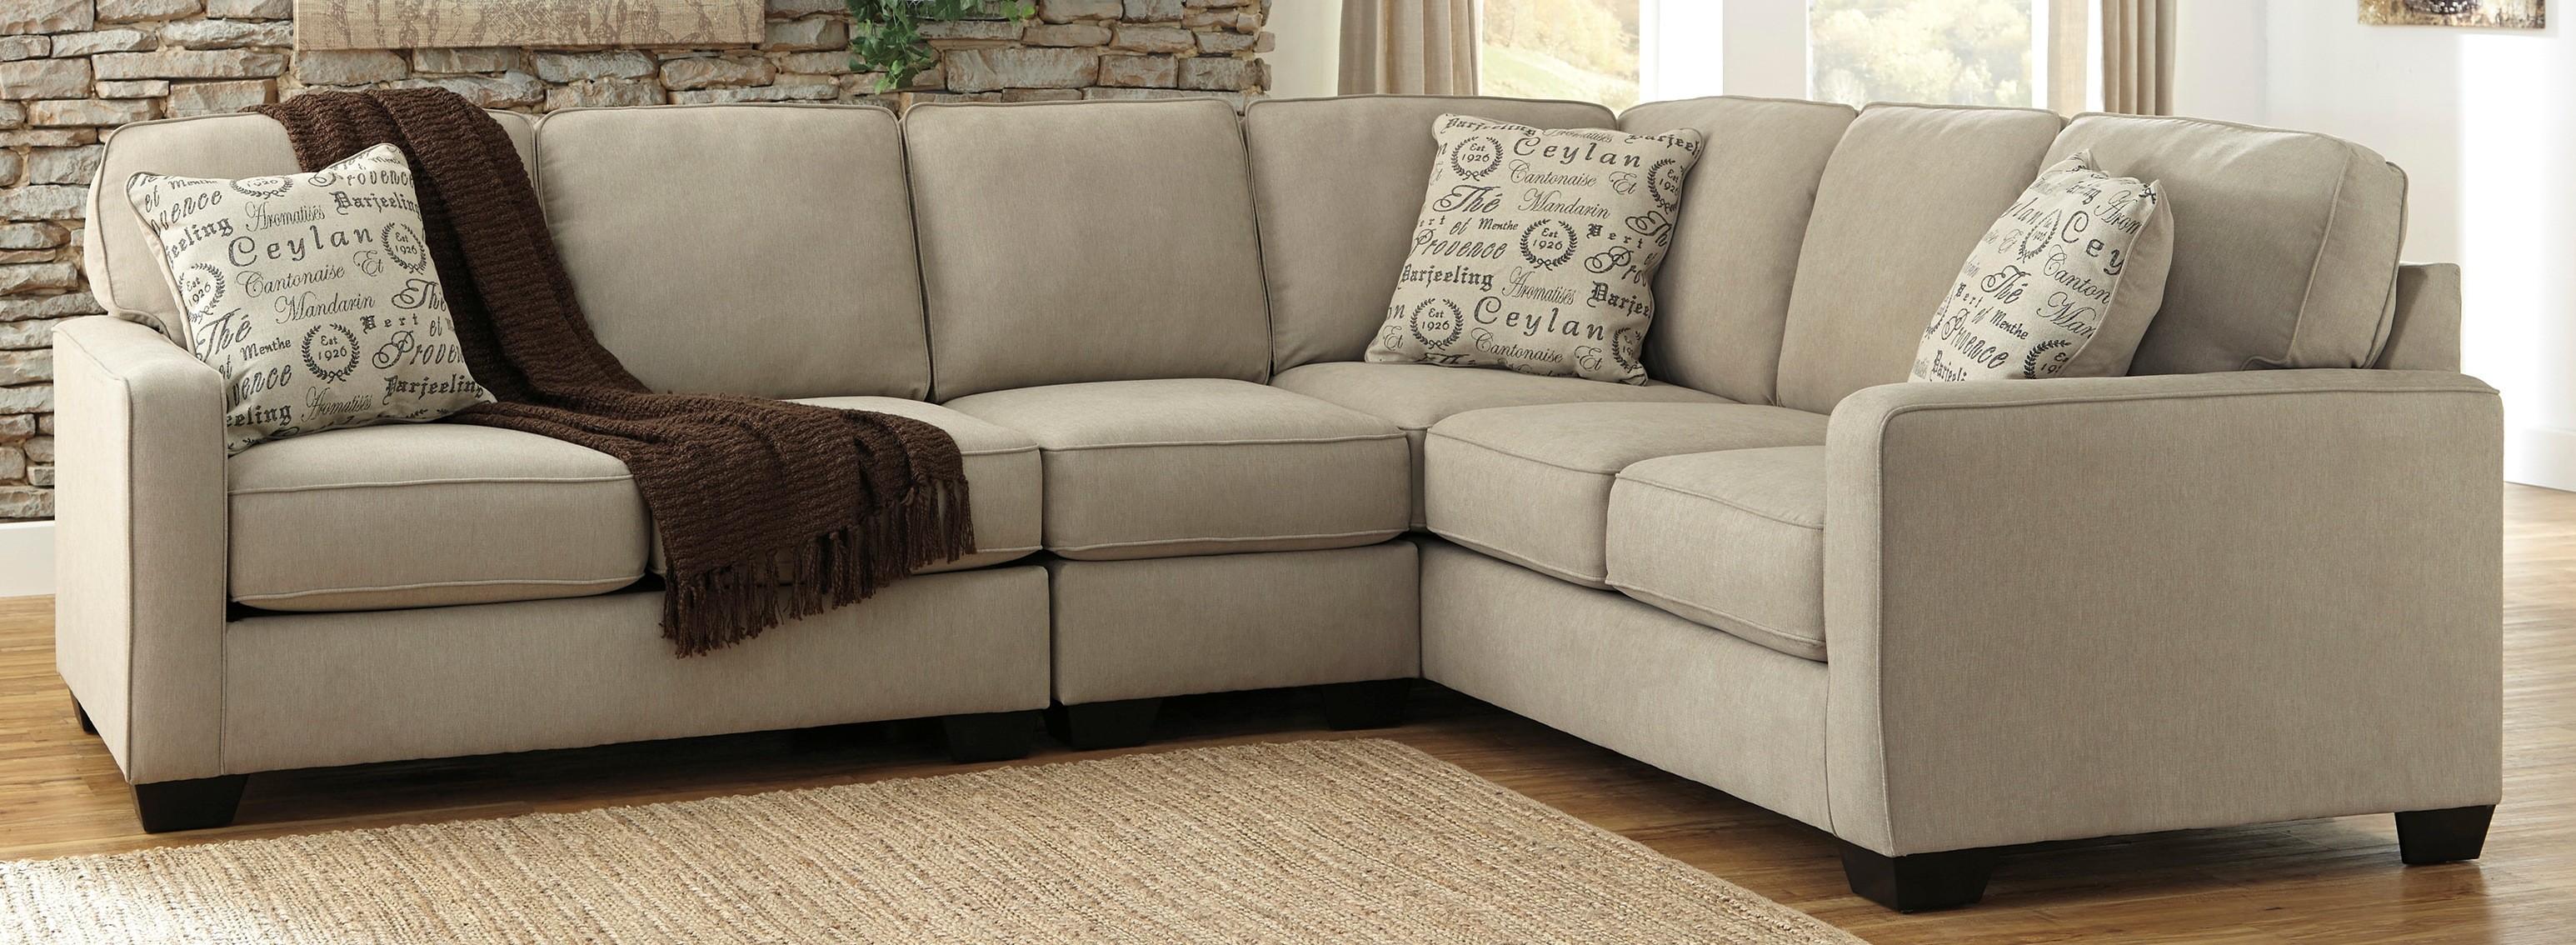 ashley furniture alenya quartz sectional a 1 – AMEAG HOMES